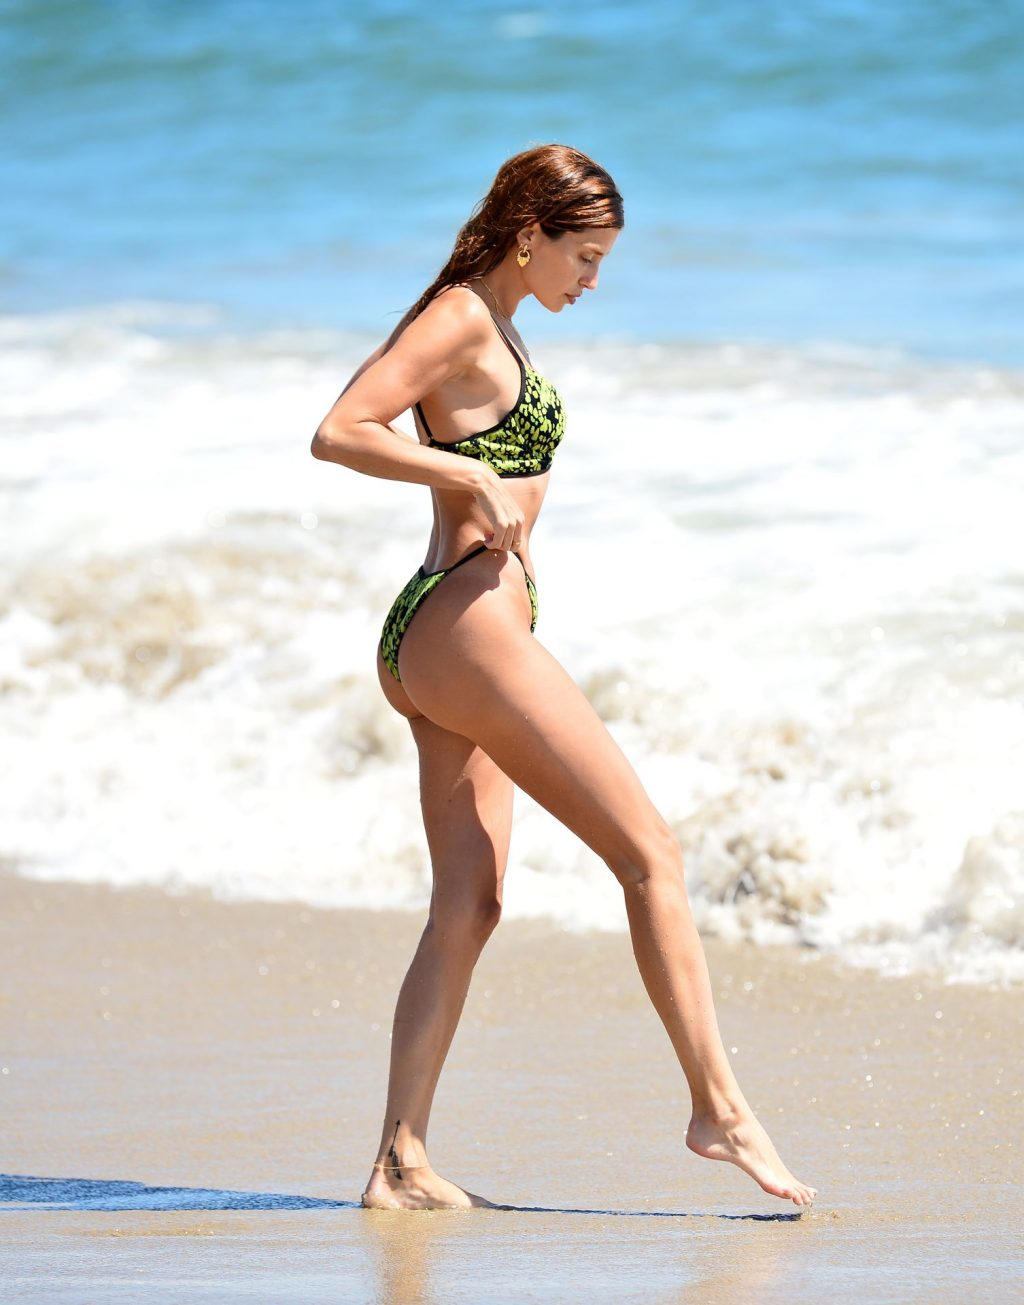 Nicole Williams Flaunts Her Incredible Bikini Body on the Beach (18 Photos)